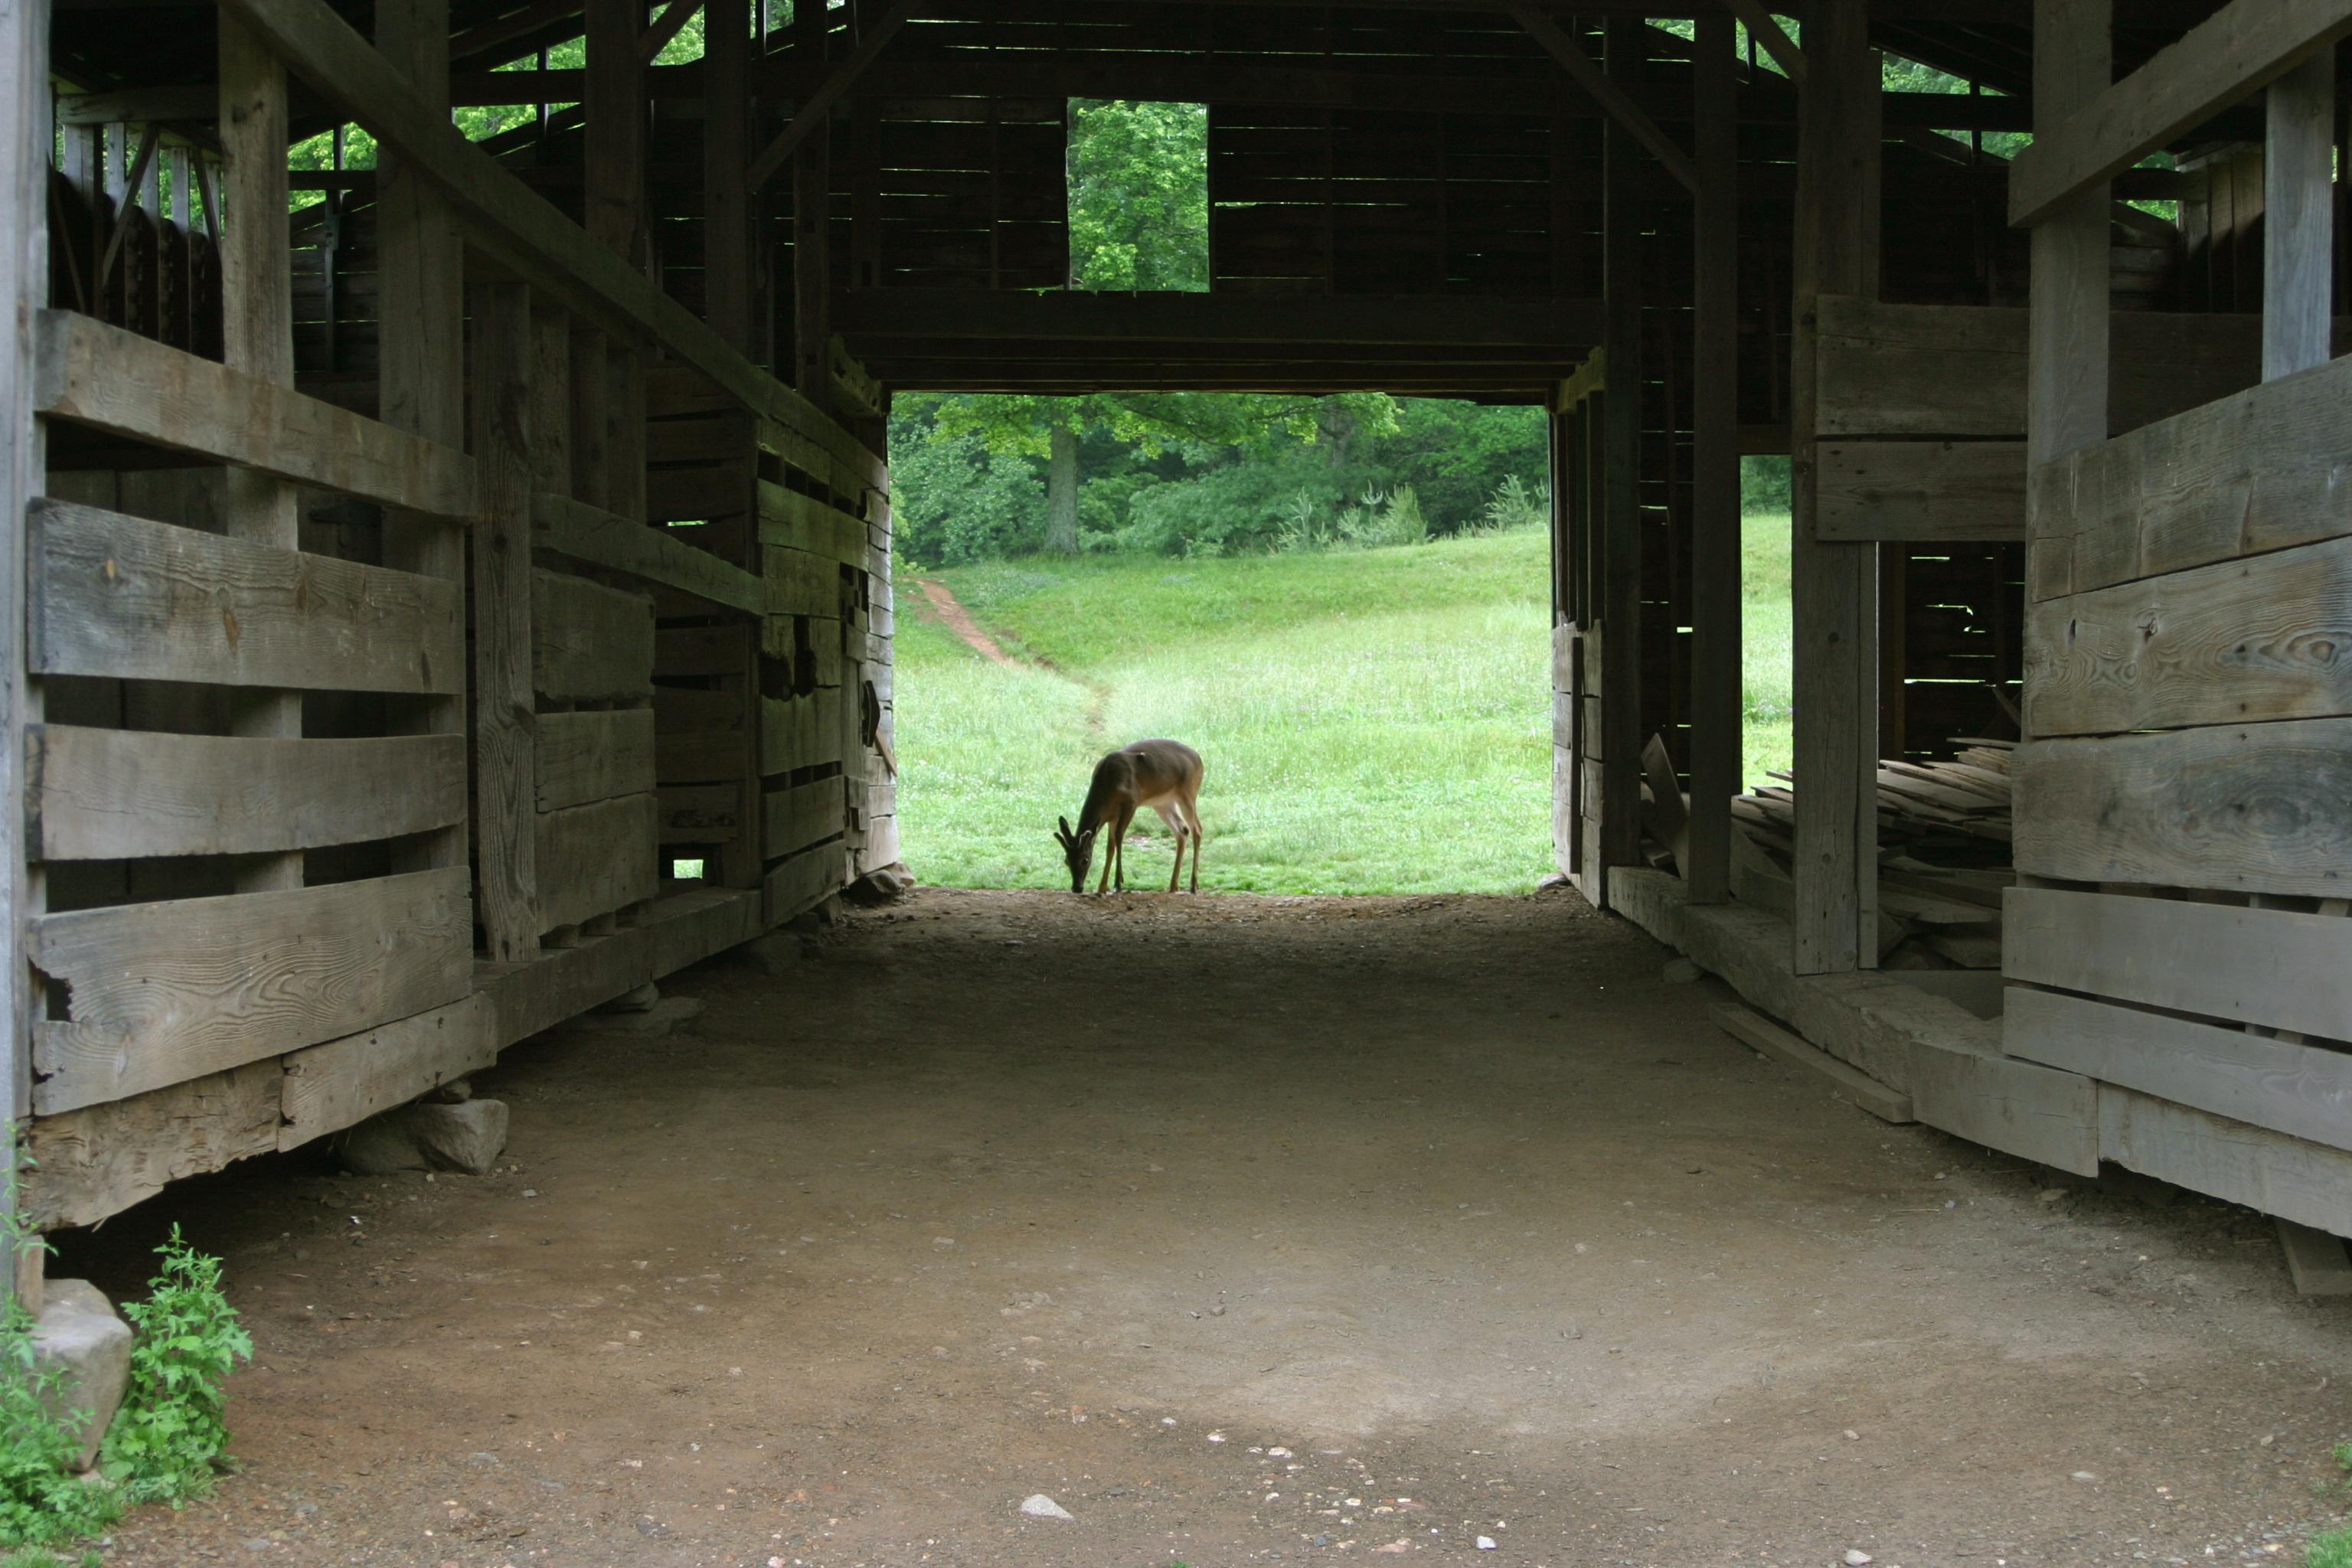 Deer Grazing in Barn